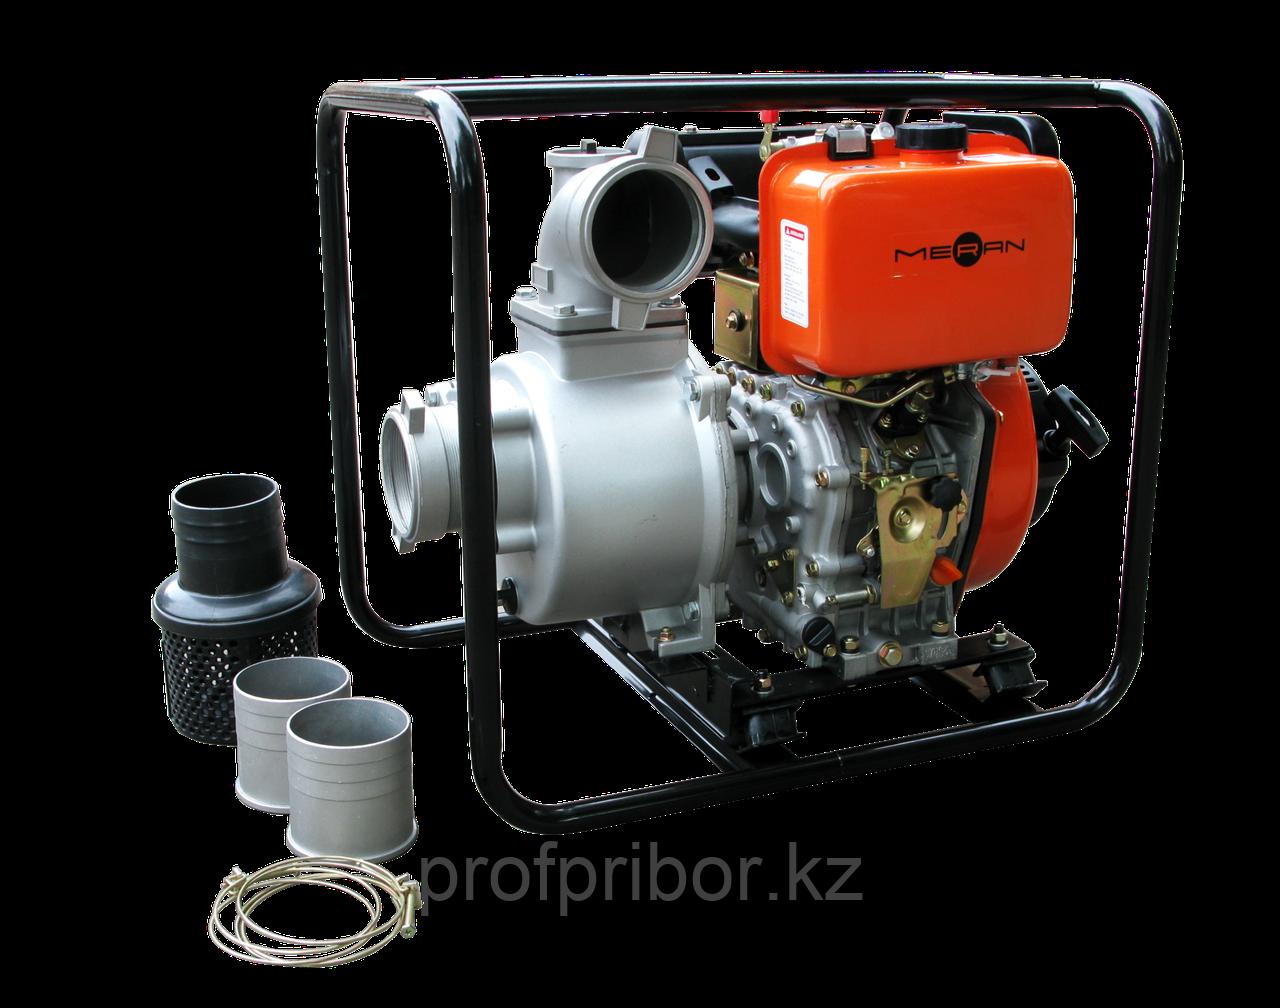 Дизельная мотопомпа для загрязненных вод Meran MPD401